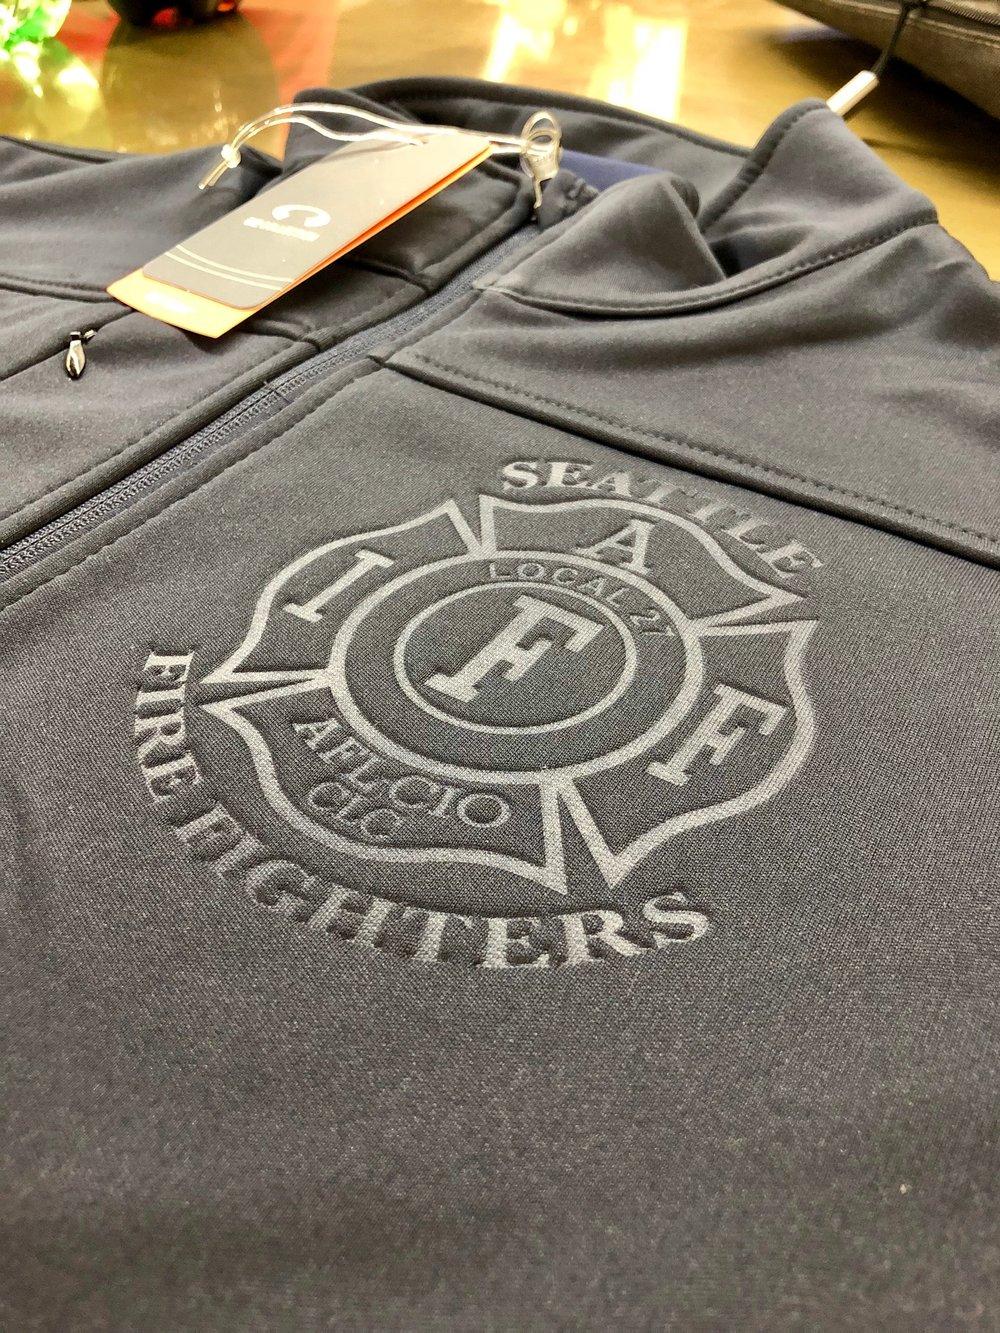 logounltd_laser_etching_embroidery_screen_printing_corporate_apparel_uniform_custom_tshirts_uniforms_dye_sublimation_kirkland_bellevue_seattle_redmond_branded_merchandise_promotional_products (5).jpg